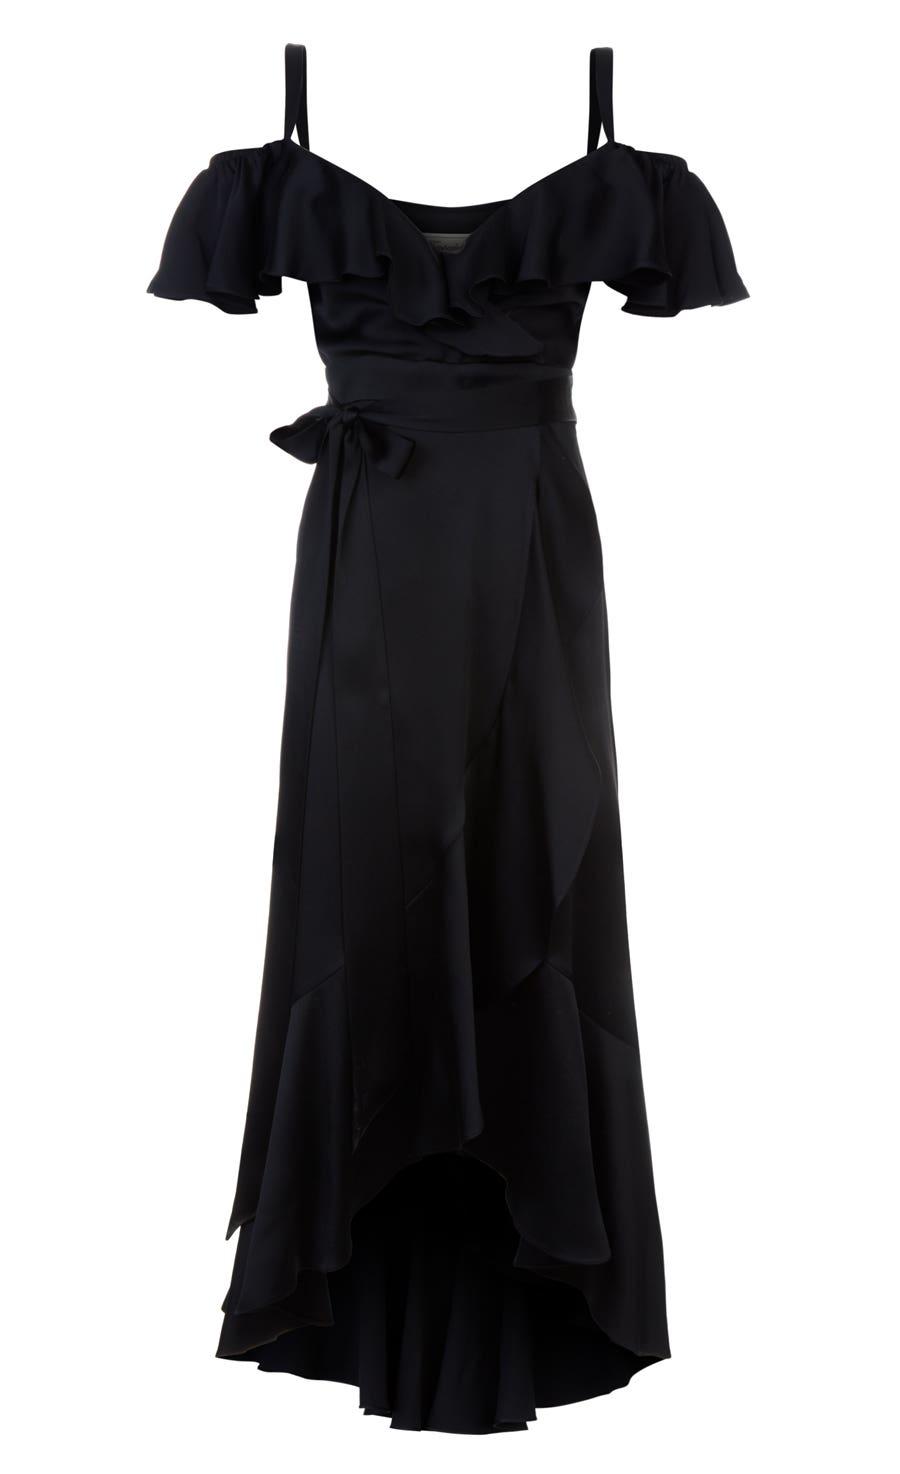 Carnation Dress, Black